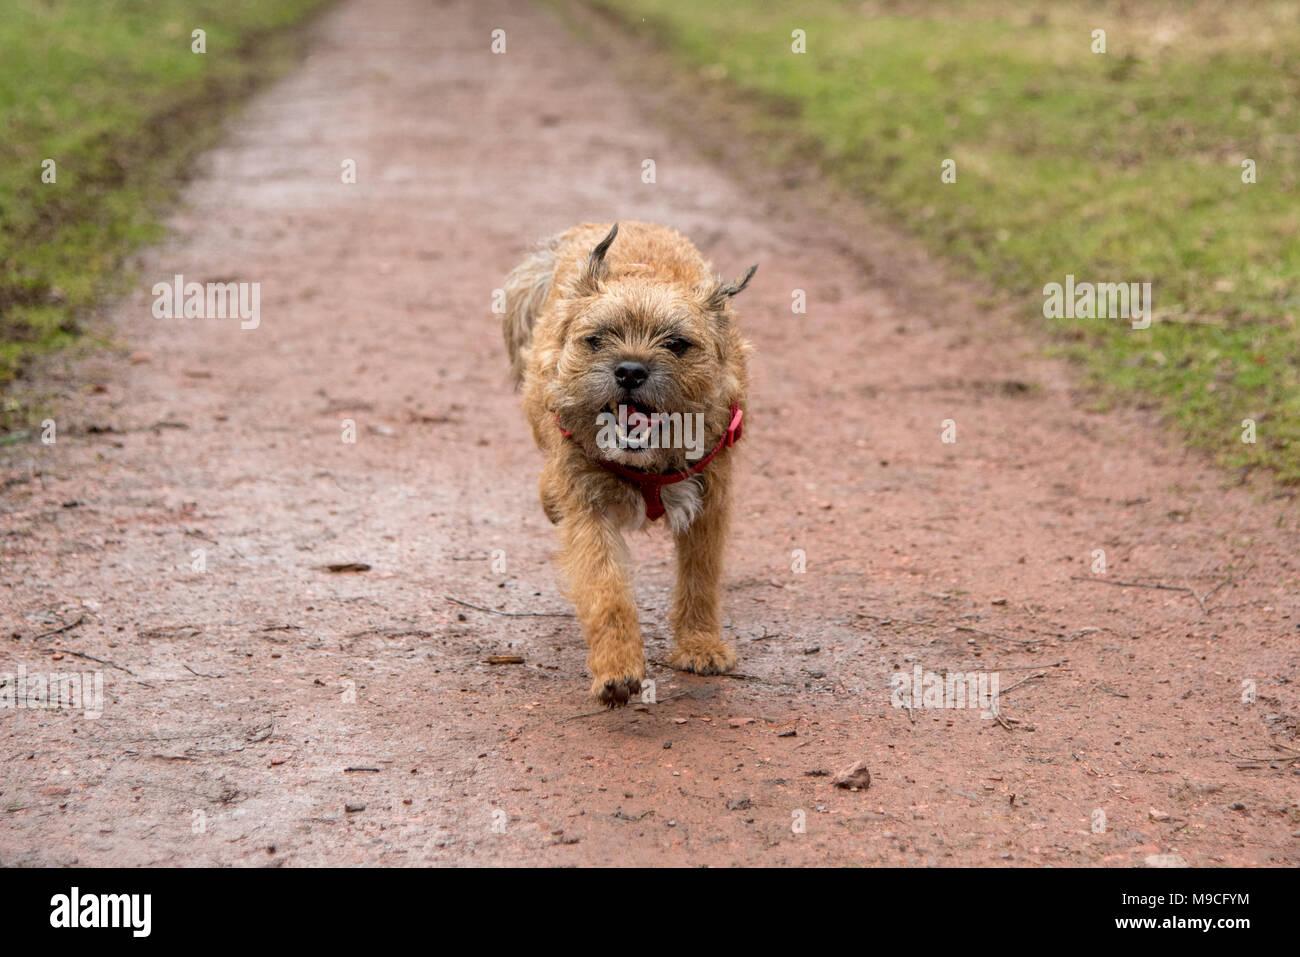 Dog running - Stock Image